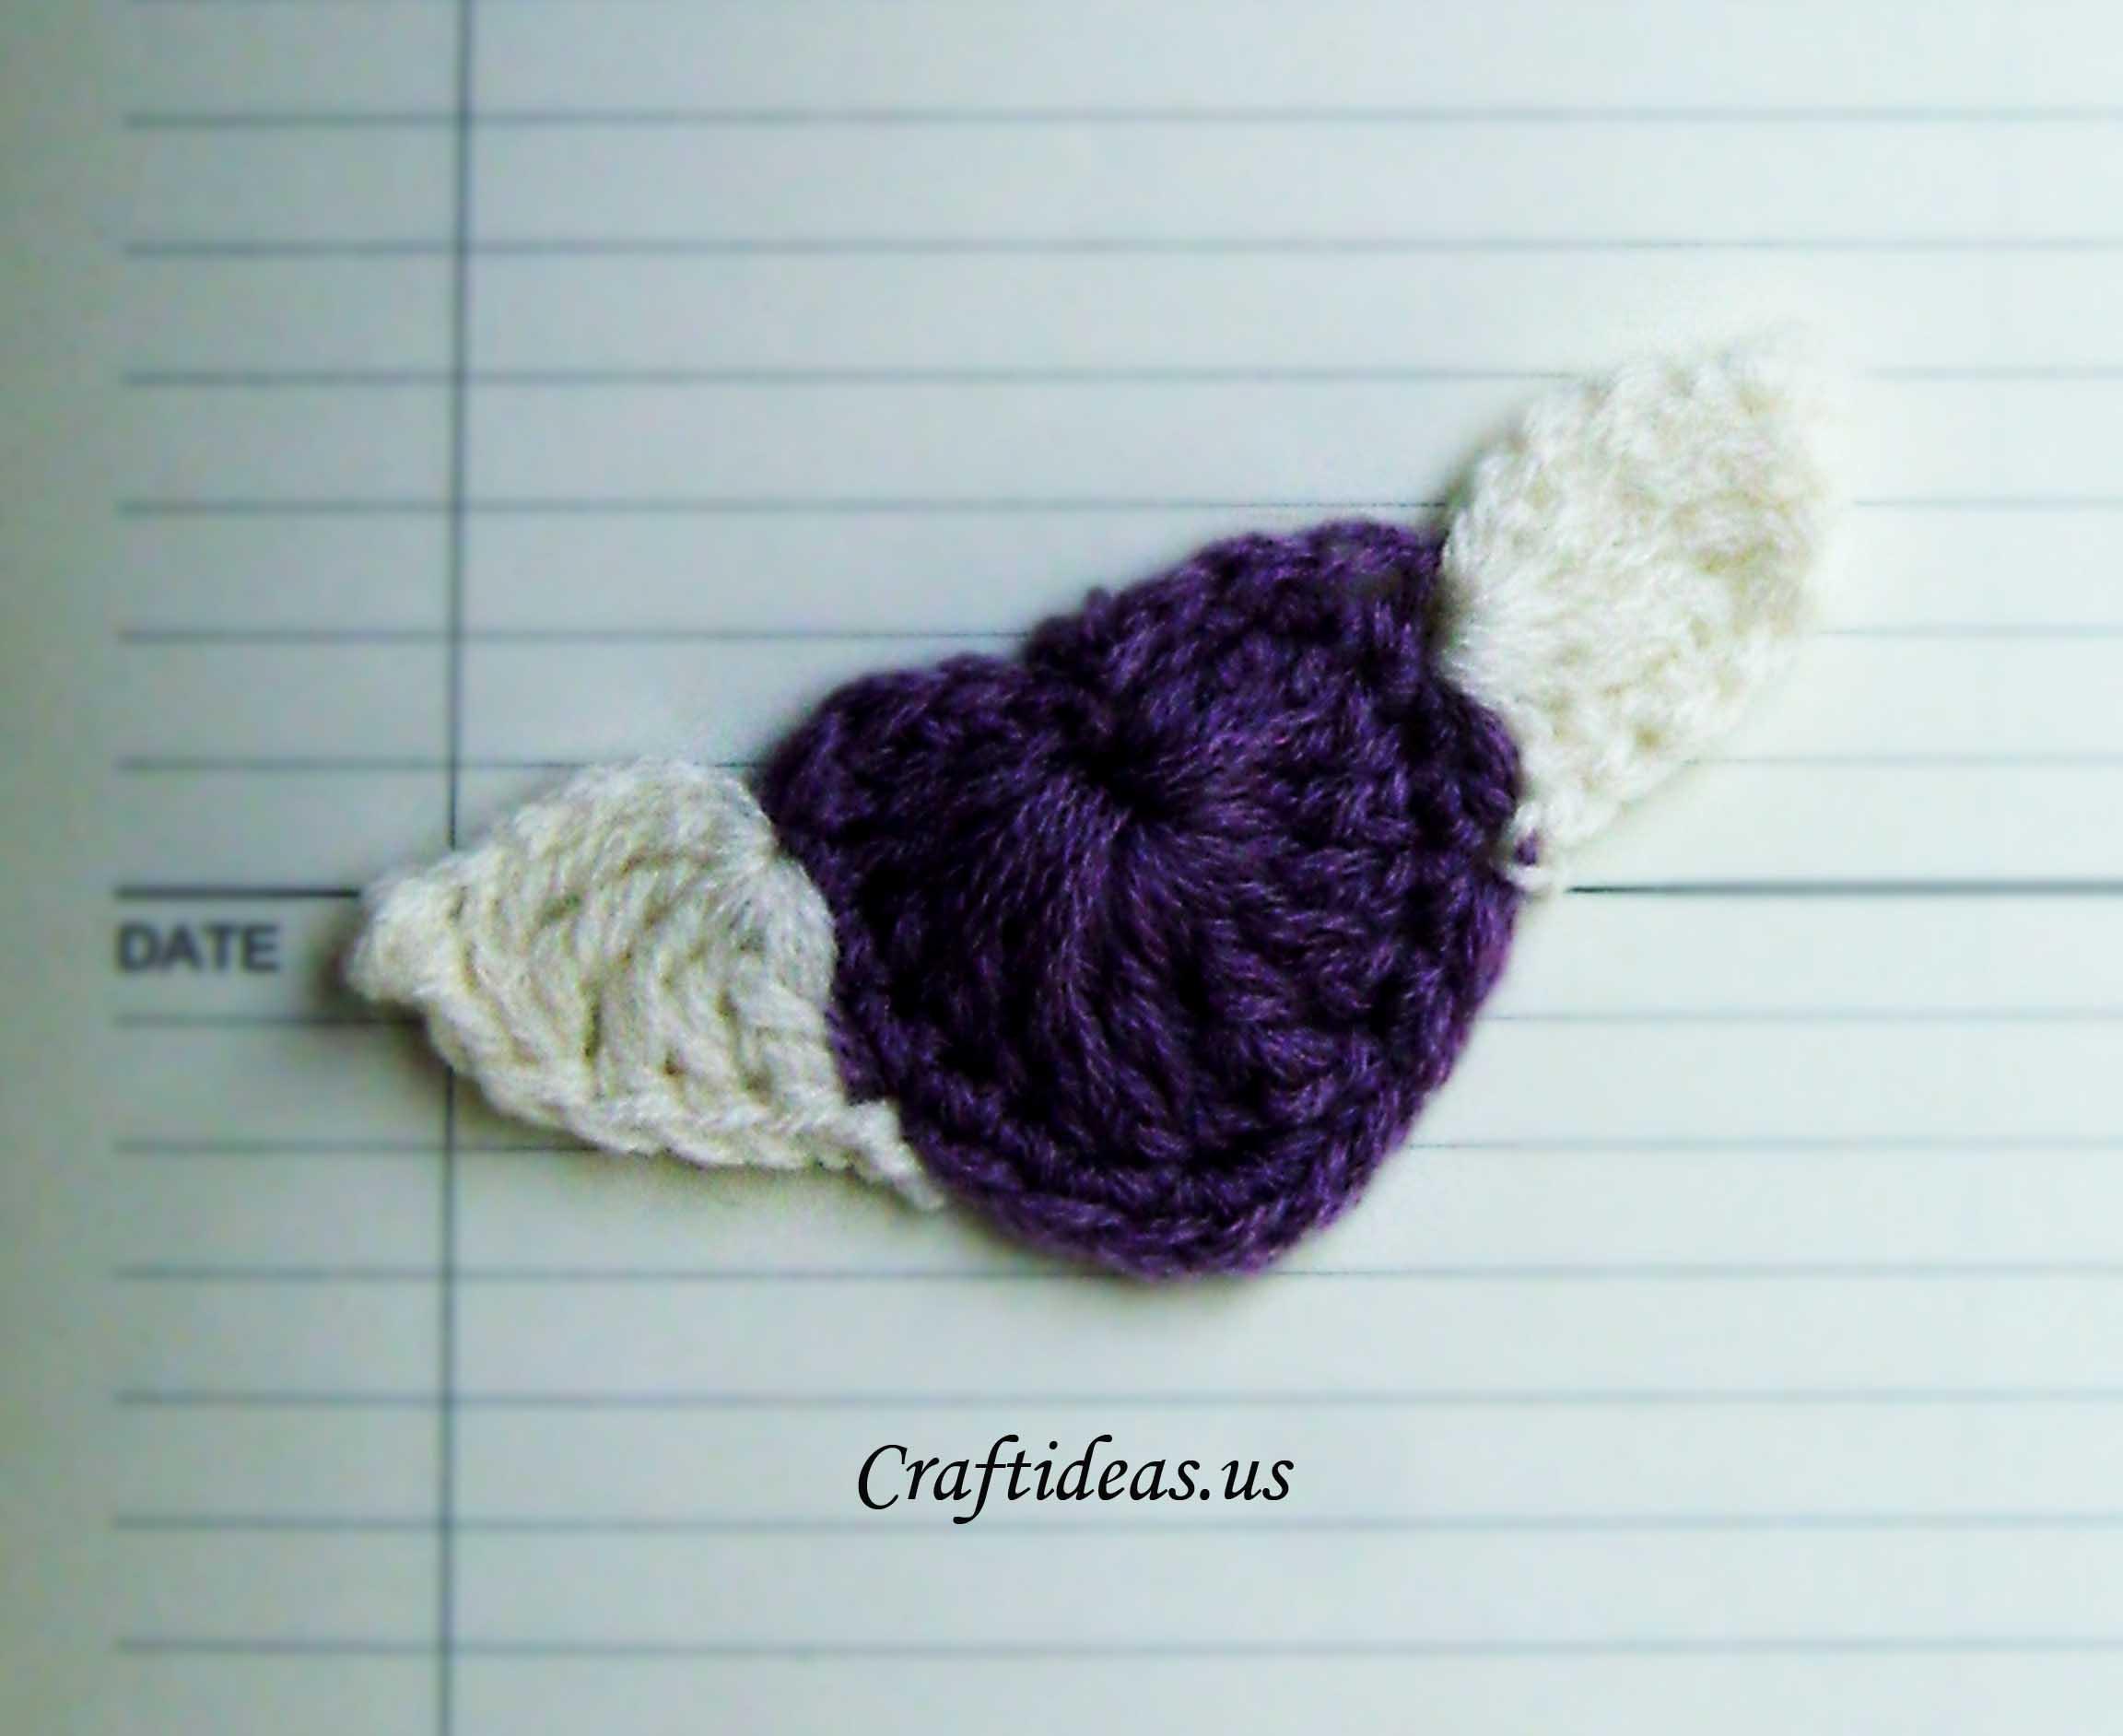 Valentine craft ideas: Crochet heart with wings - Craft Ideas